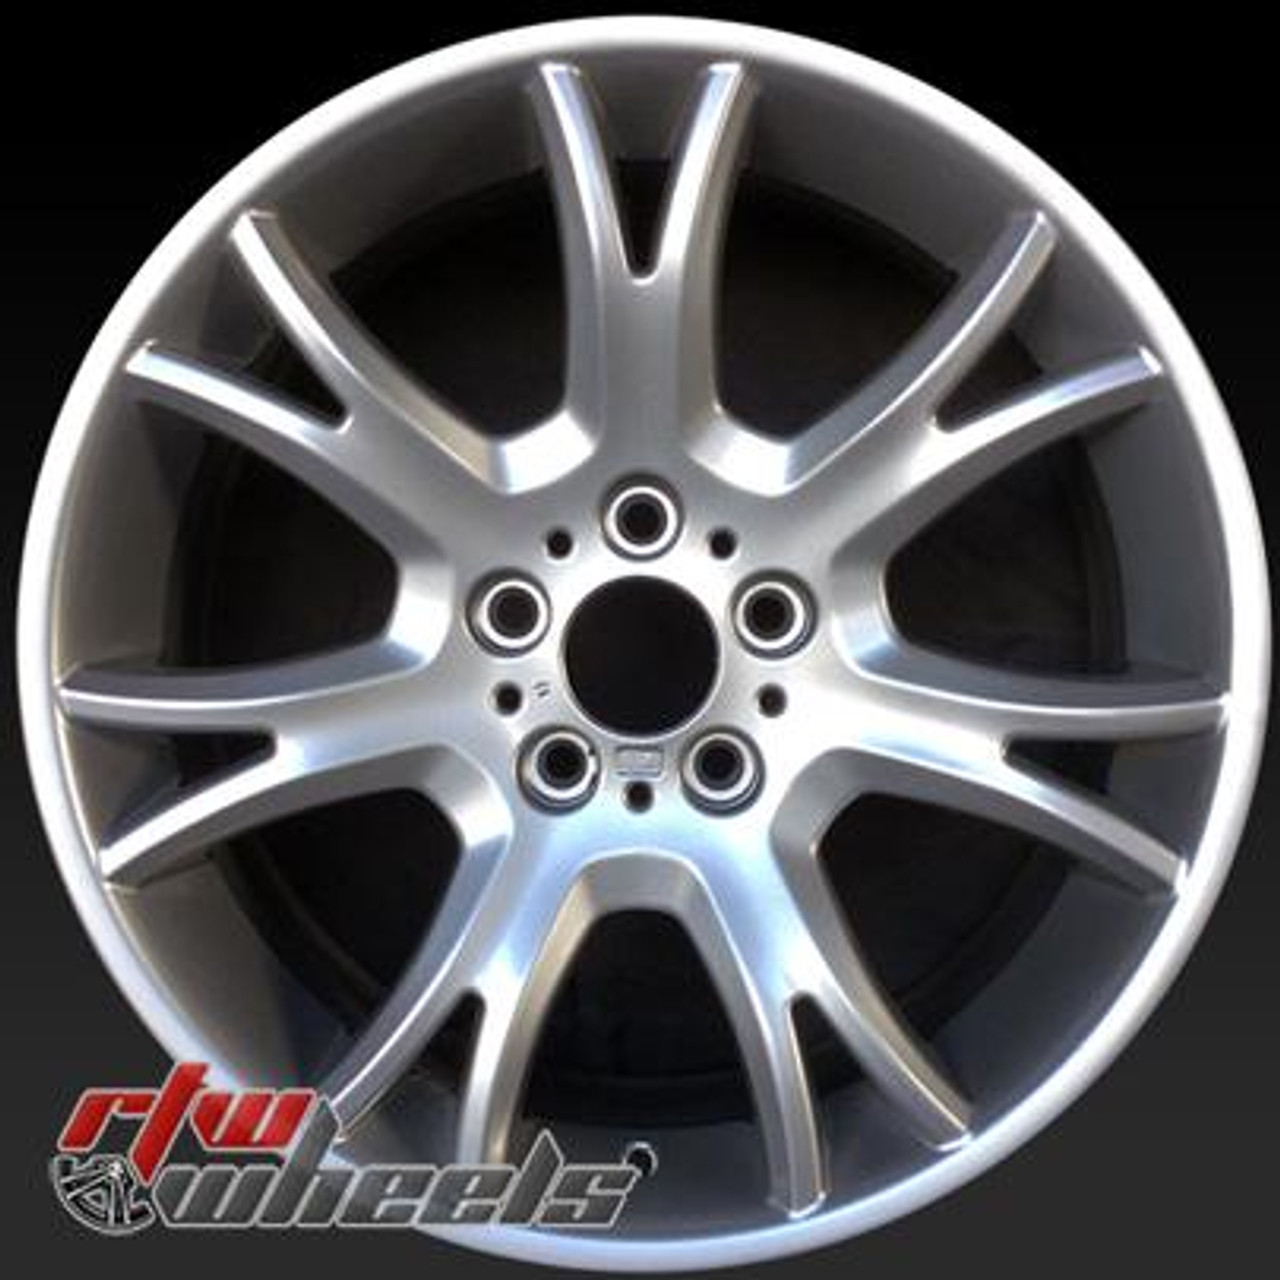 19 Bmw X3 Oem Wheels For Sale 2004 2010 Gray Stock Rims 59566